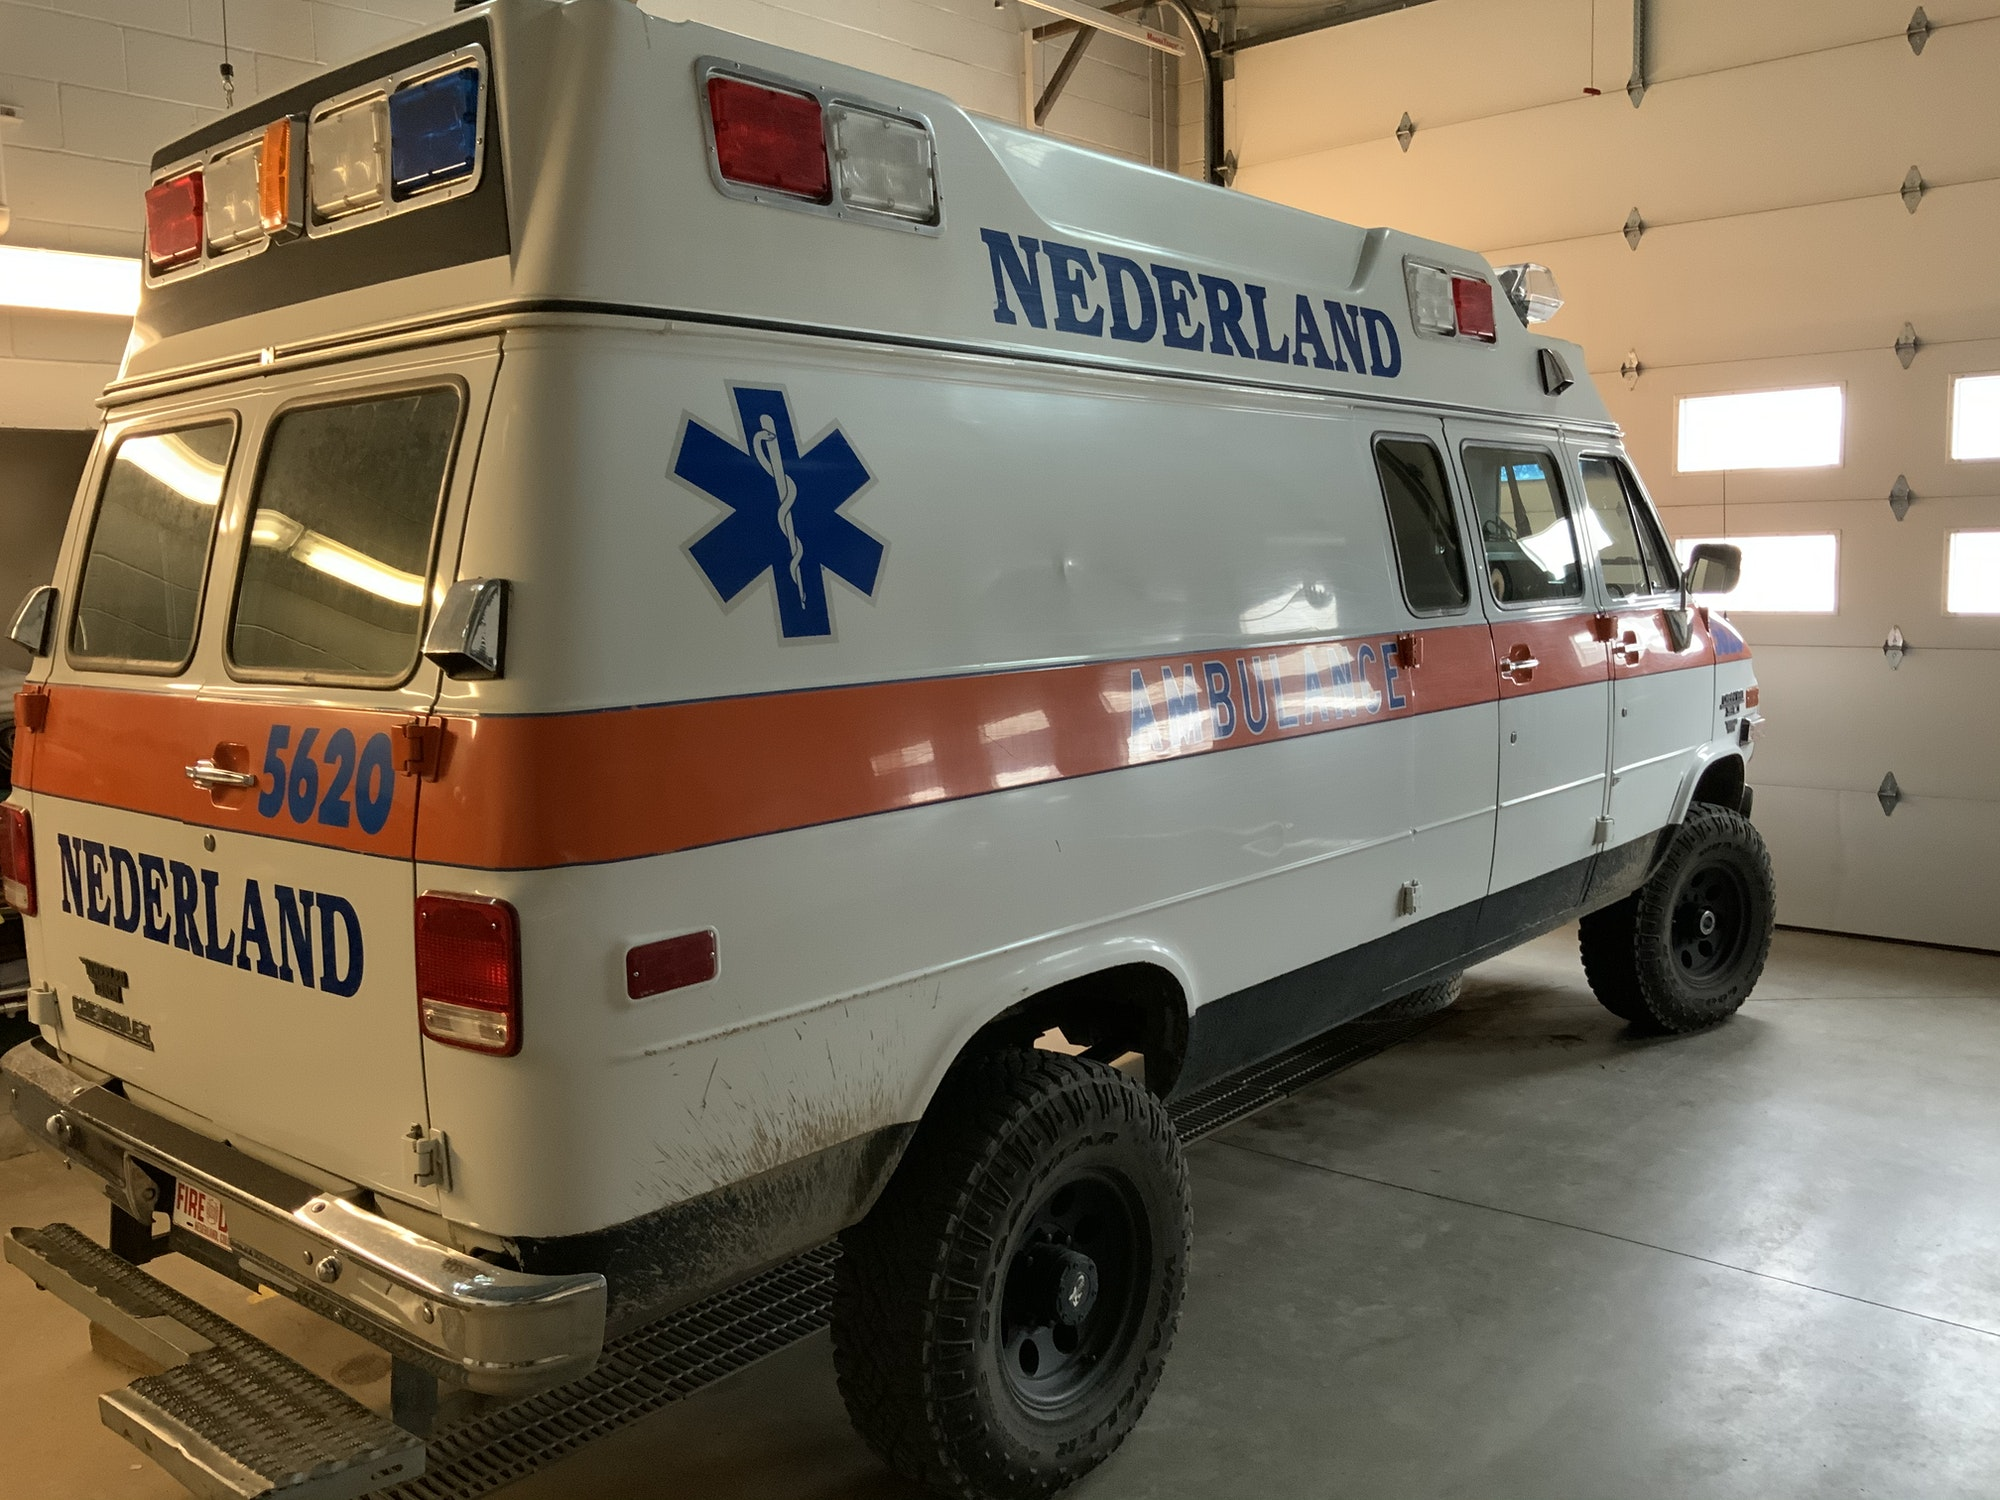 May contain: transportation, vehicle, truck, van, and ambulance